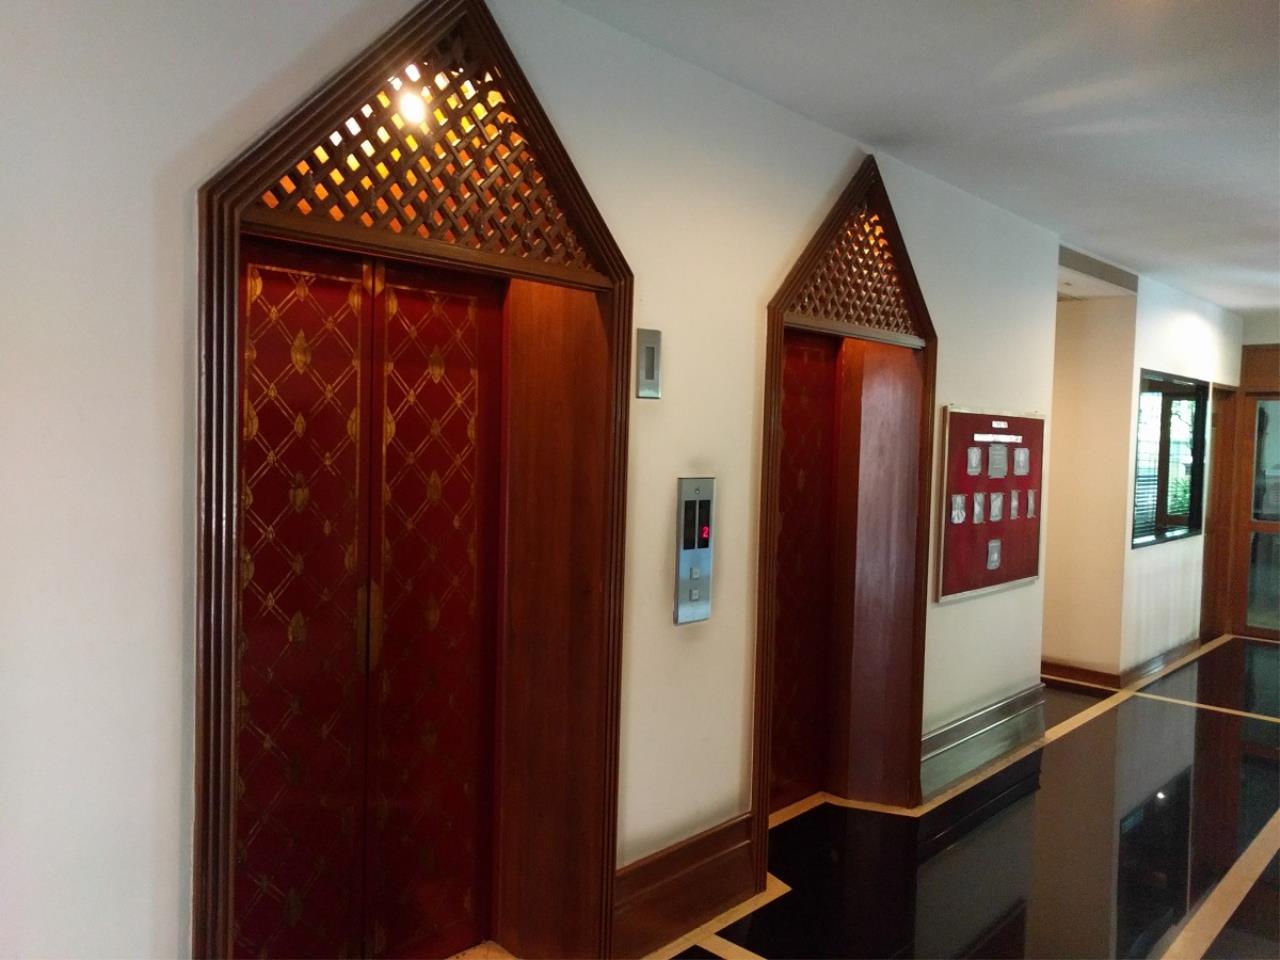 RE/MAX CondoDee Agency's Thai Elegance Luxury Condominium - Entire Building for Sale 25